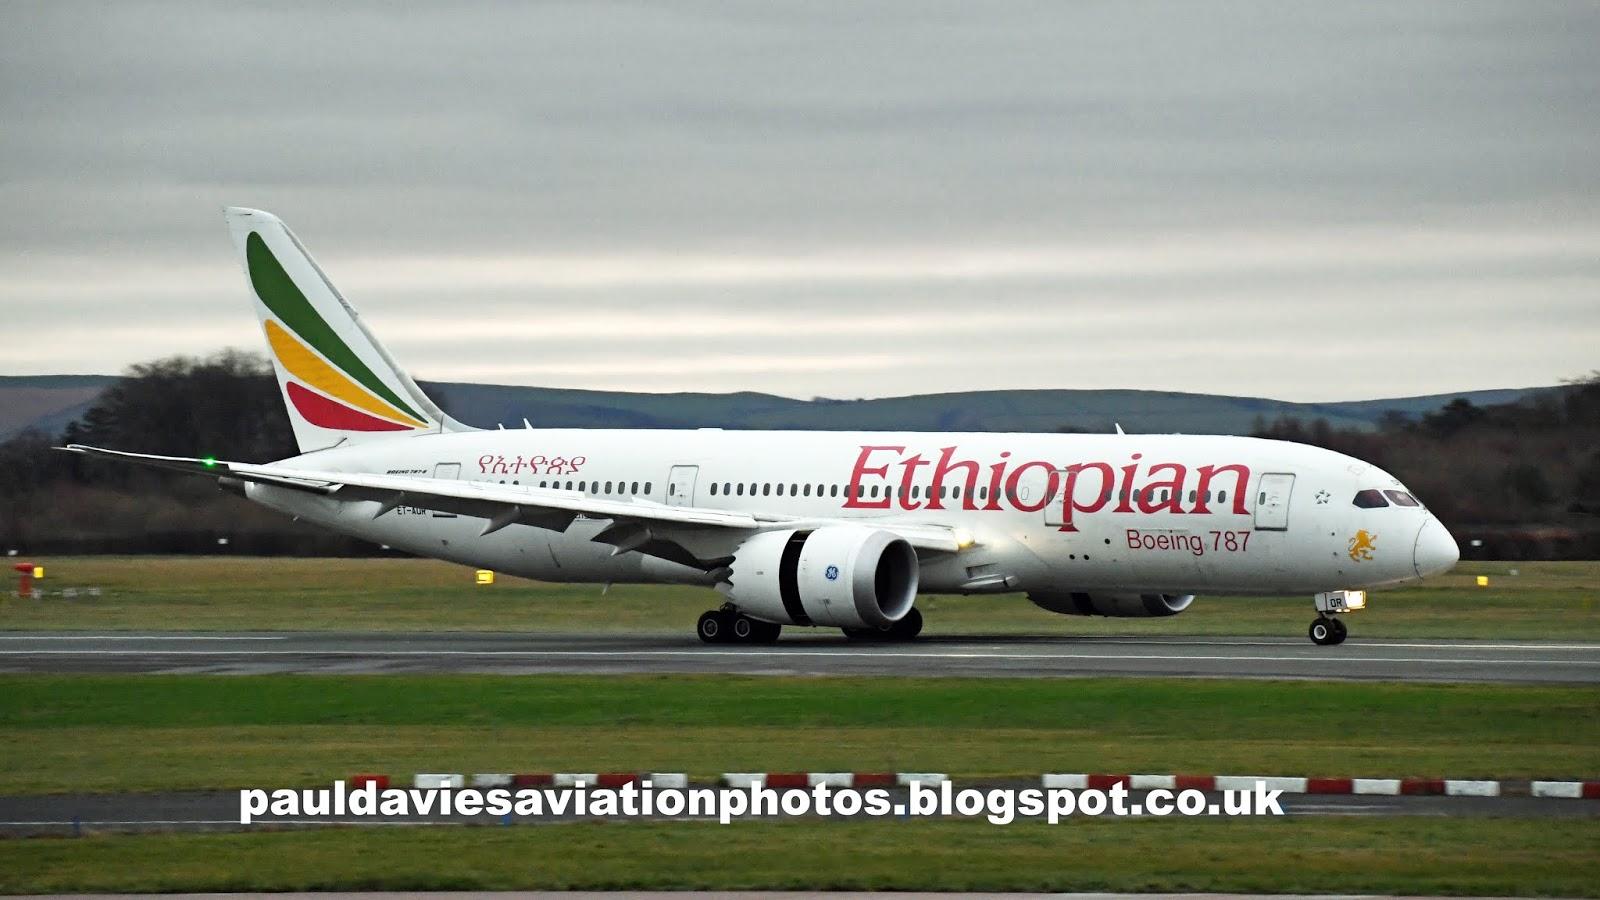 Paul Davies Aviation Photos: Manchester (EGCC/MAN) Ethiopian Boeing